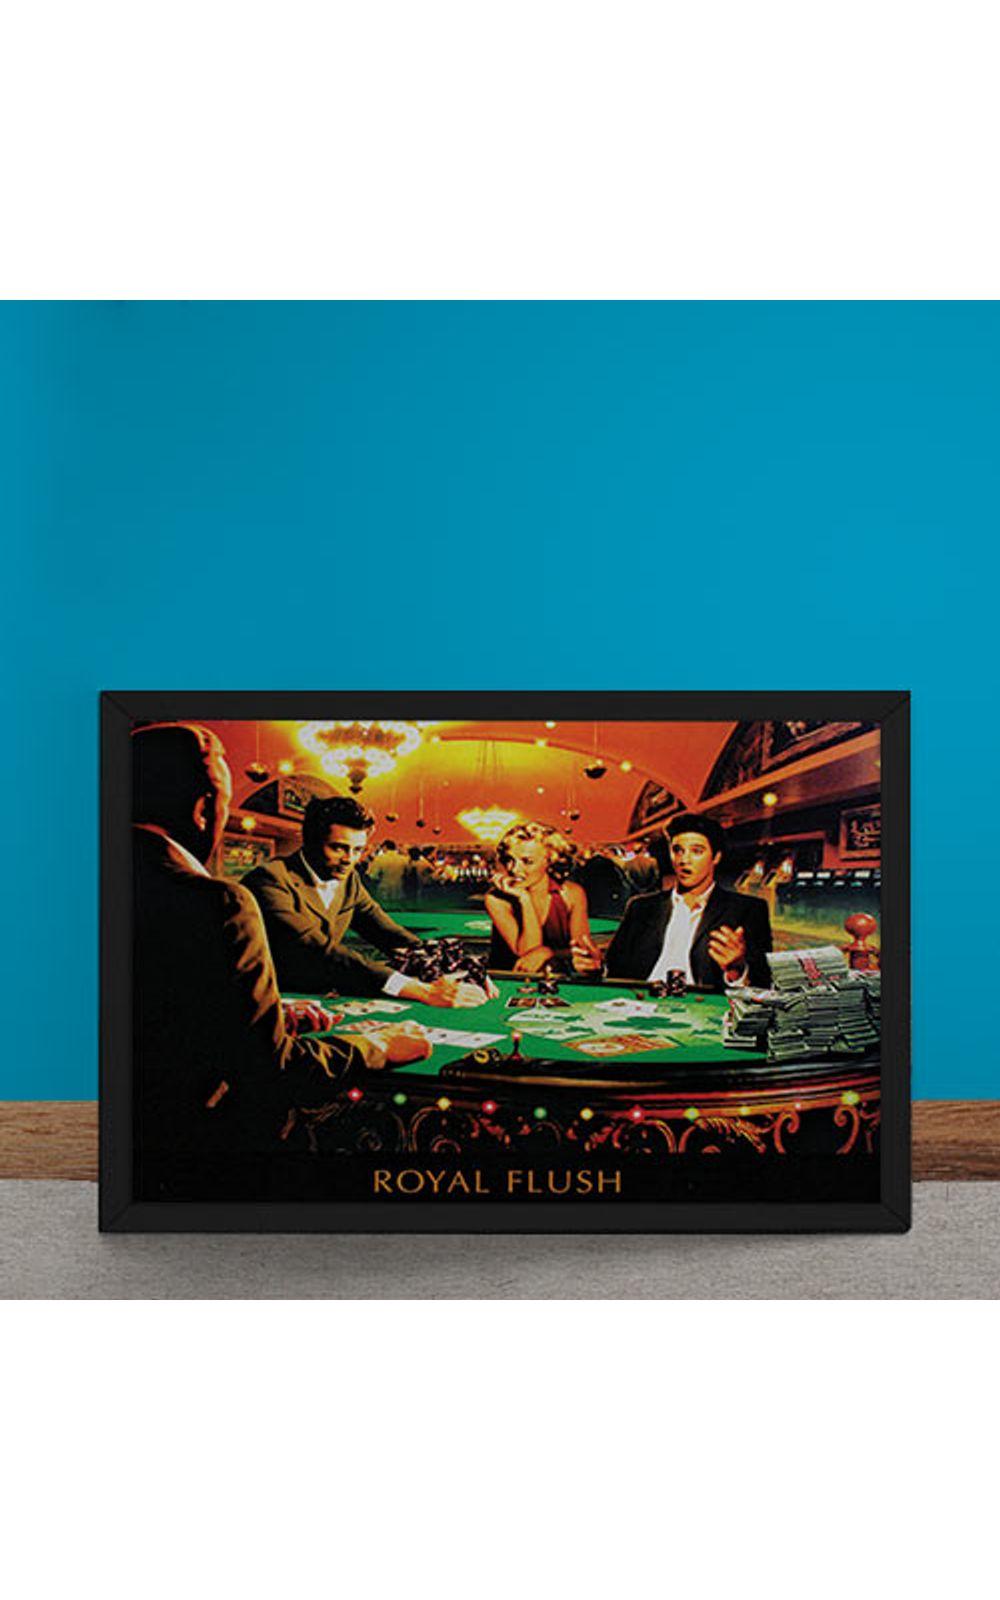 Foto 6 - Quadro Decorativo Poker Royal Flush Marylin Monroe Elvis Presley James Dean Humphrey Bogart